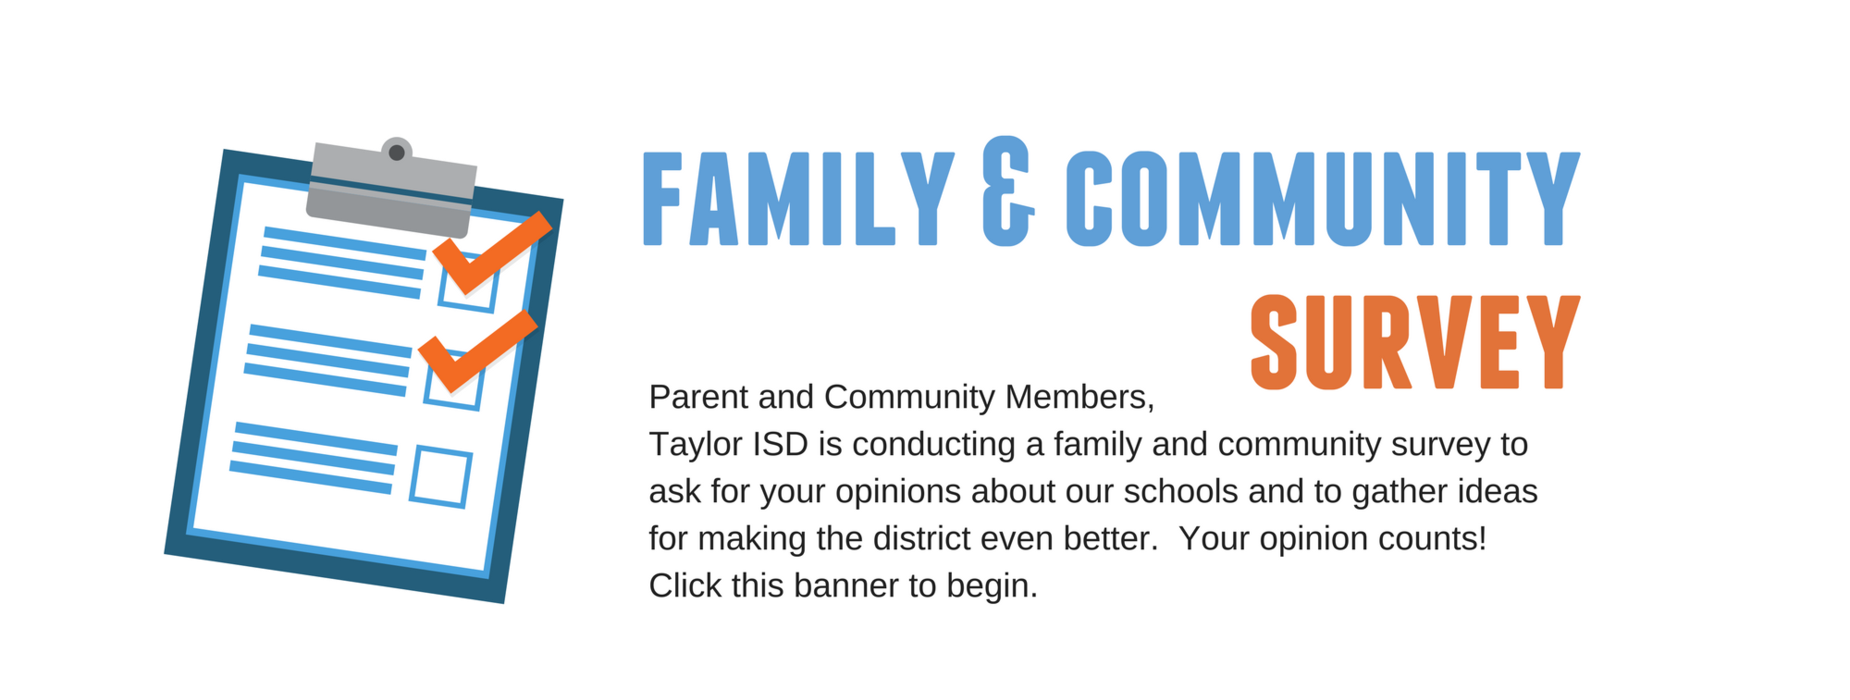 Family & Community Survey